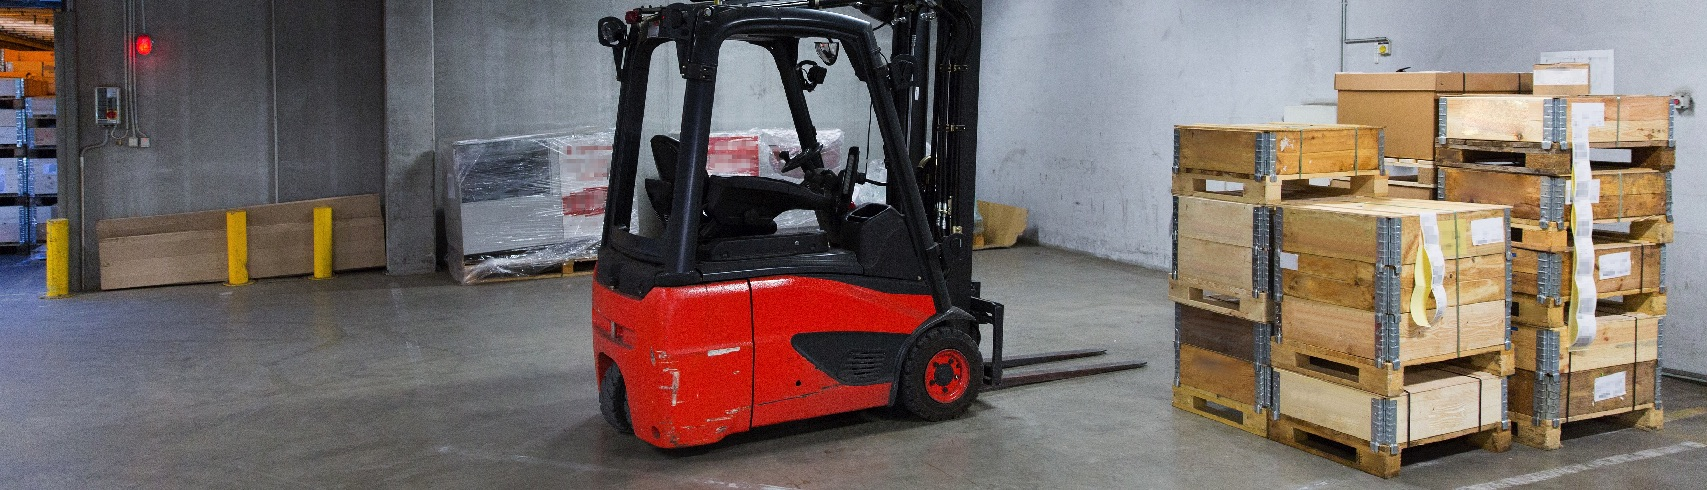 Forklift & Material Handling Rental   Los Angeles